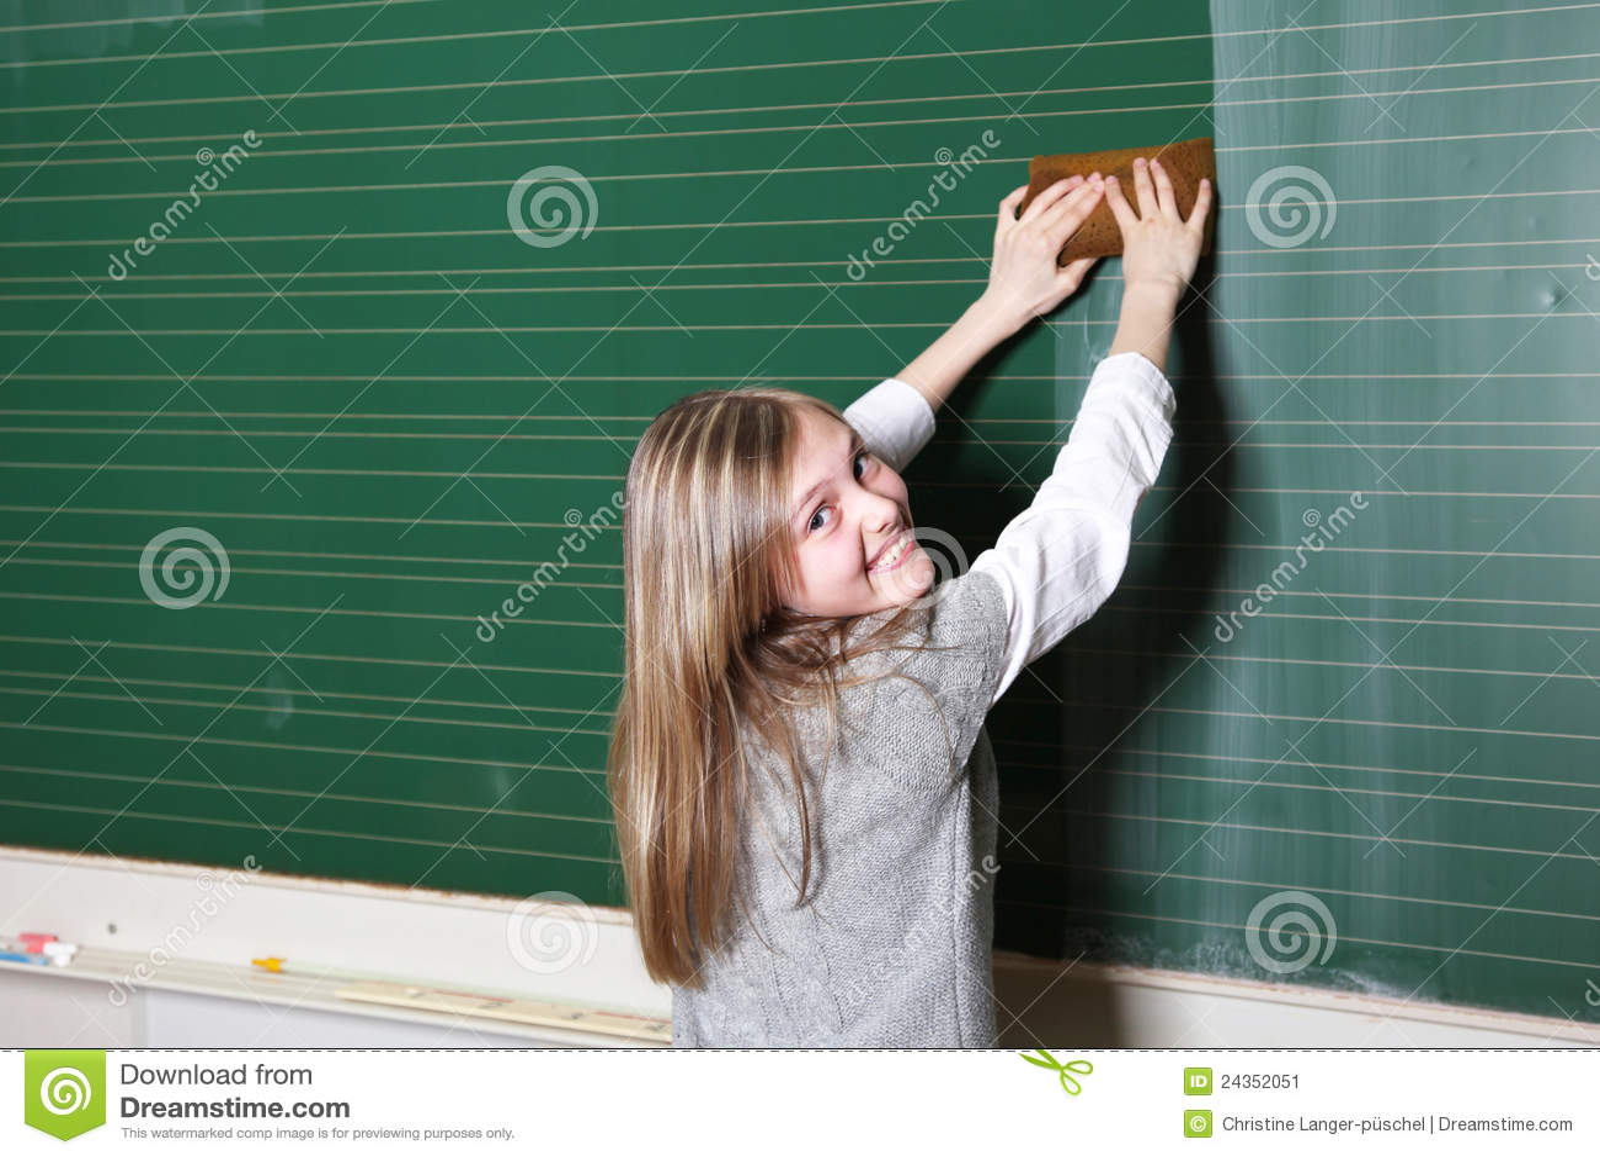 Smiling Girl Cleaning School Blackboard Stock Image